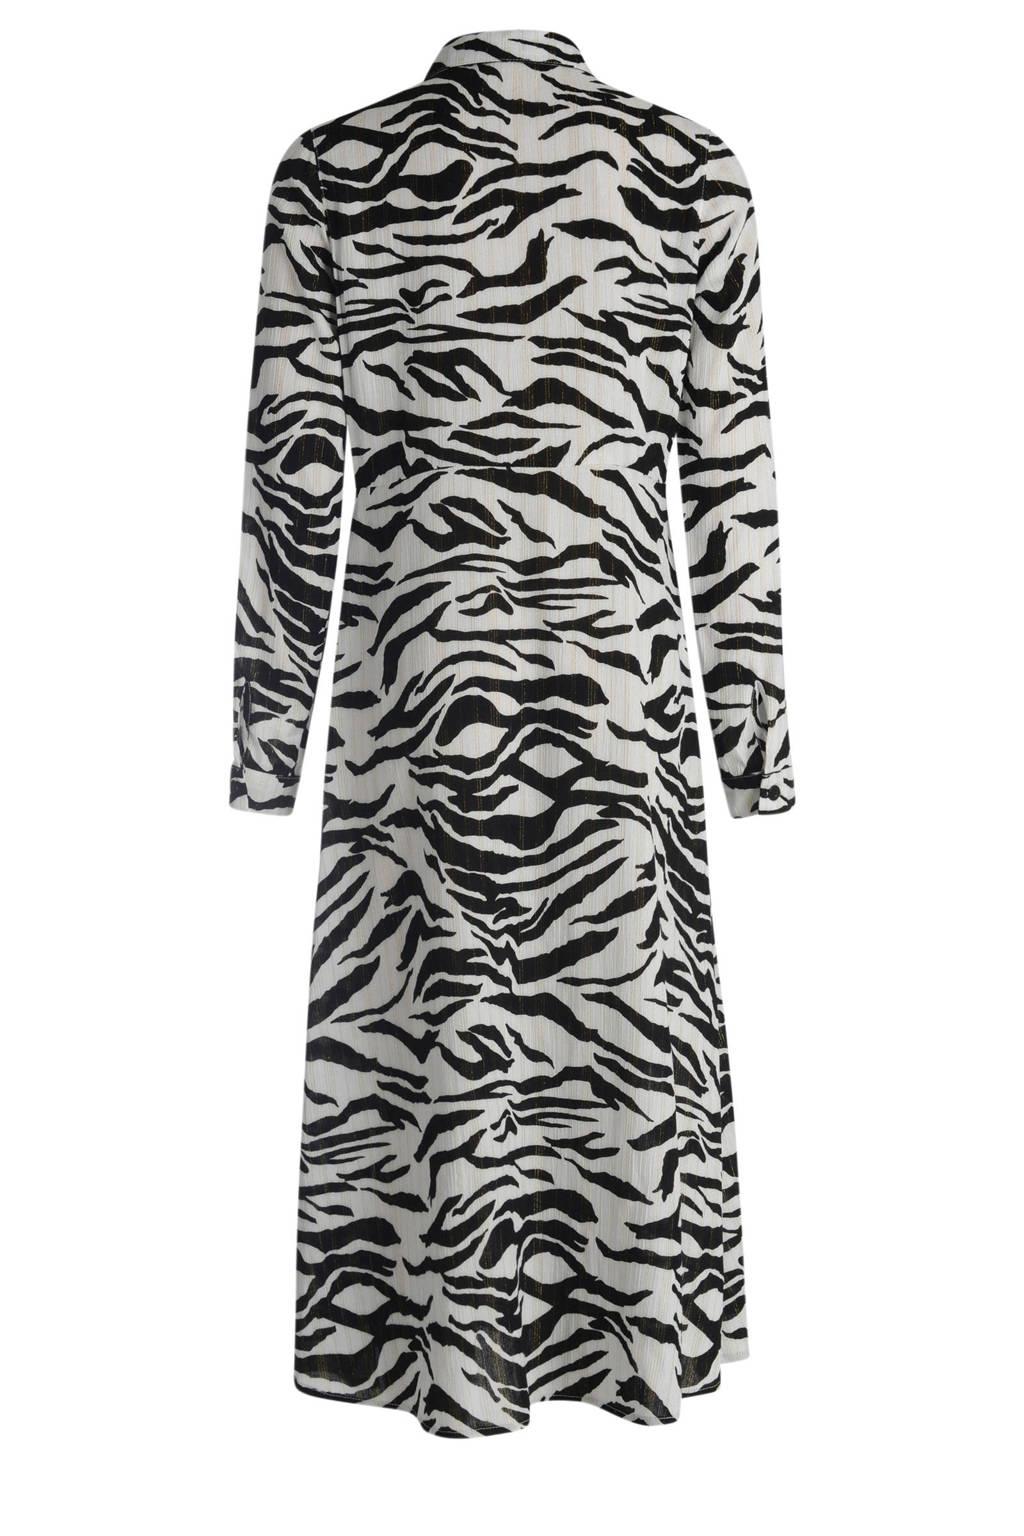 Jill & Mitch by Shoeby semi-transparante blousejurk met zebraprint zwart/wit, Zwart/wit